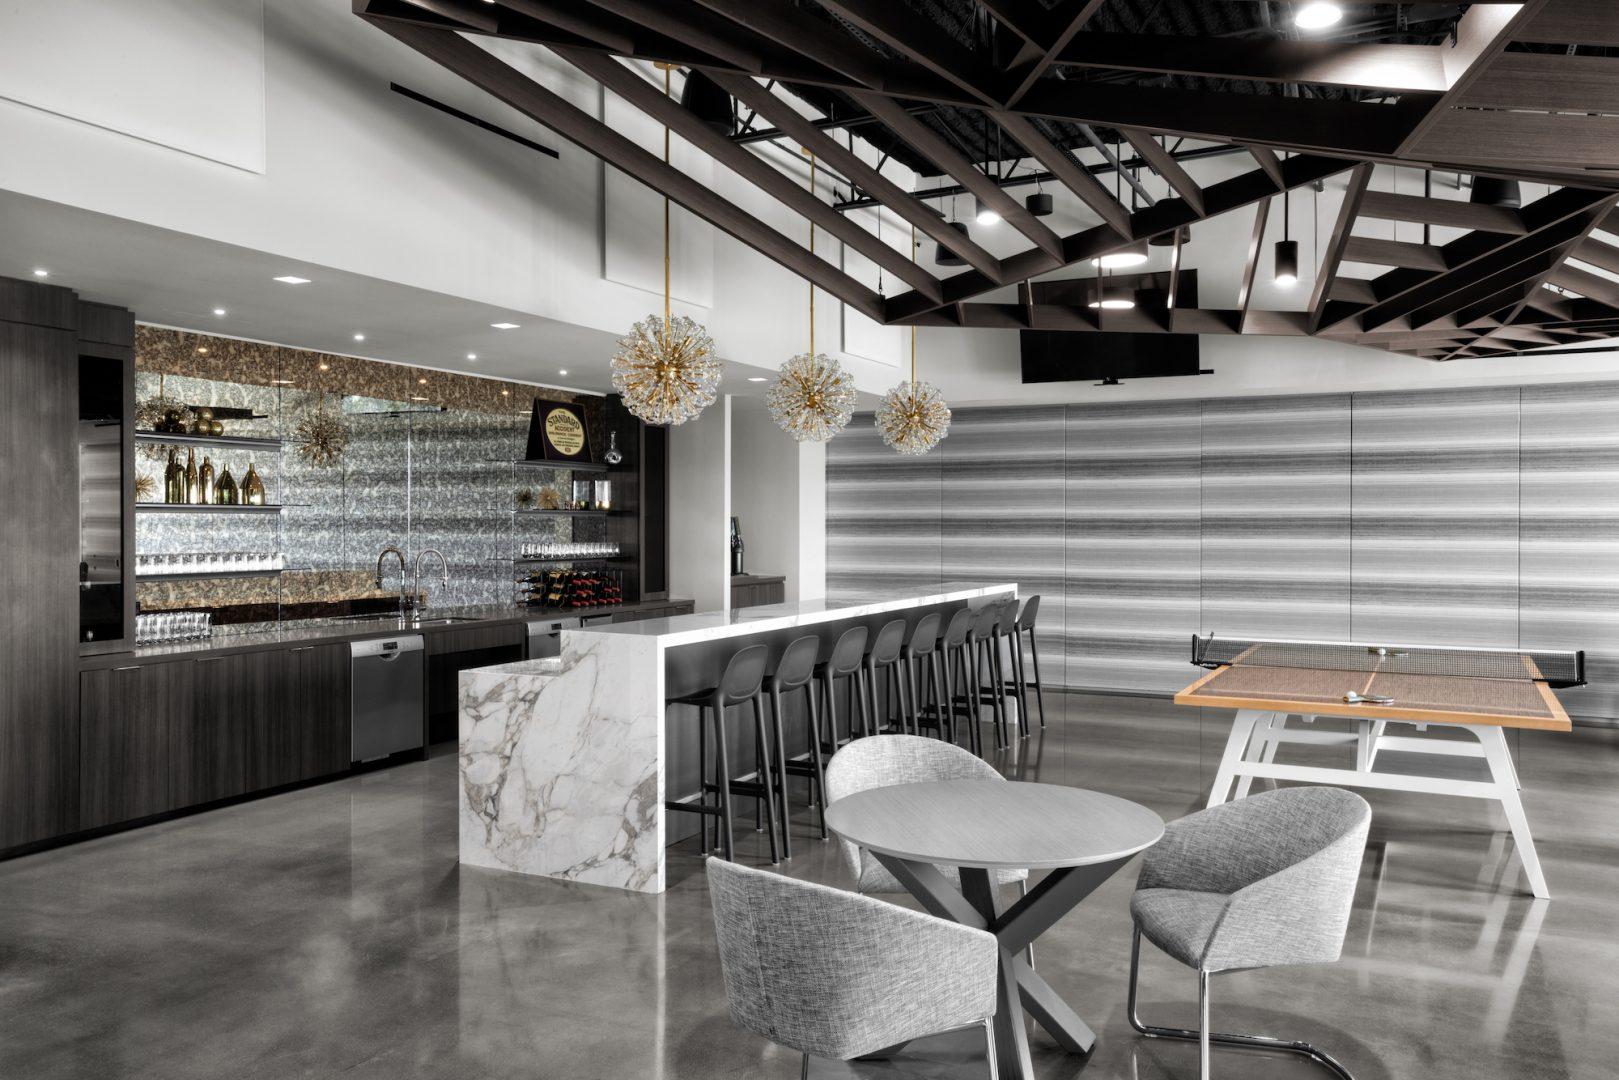 Corporate Interior Design Lockton Houston Breakout Bar and Seating